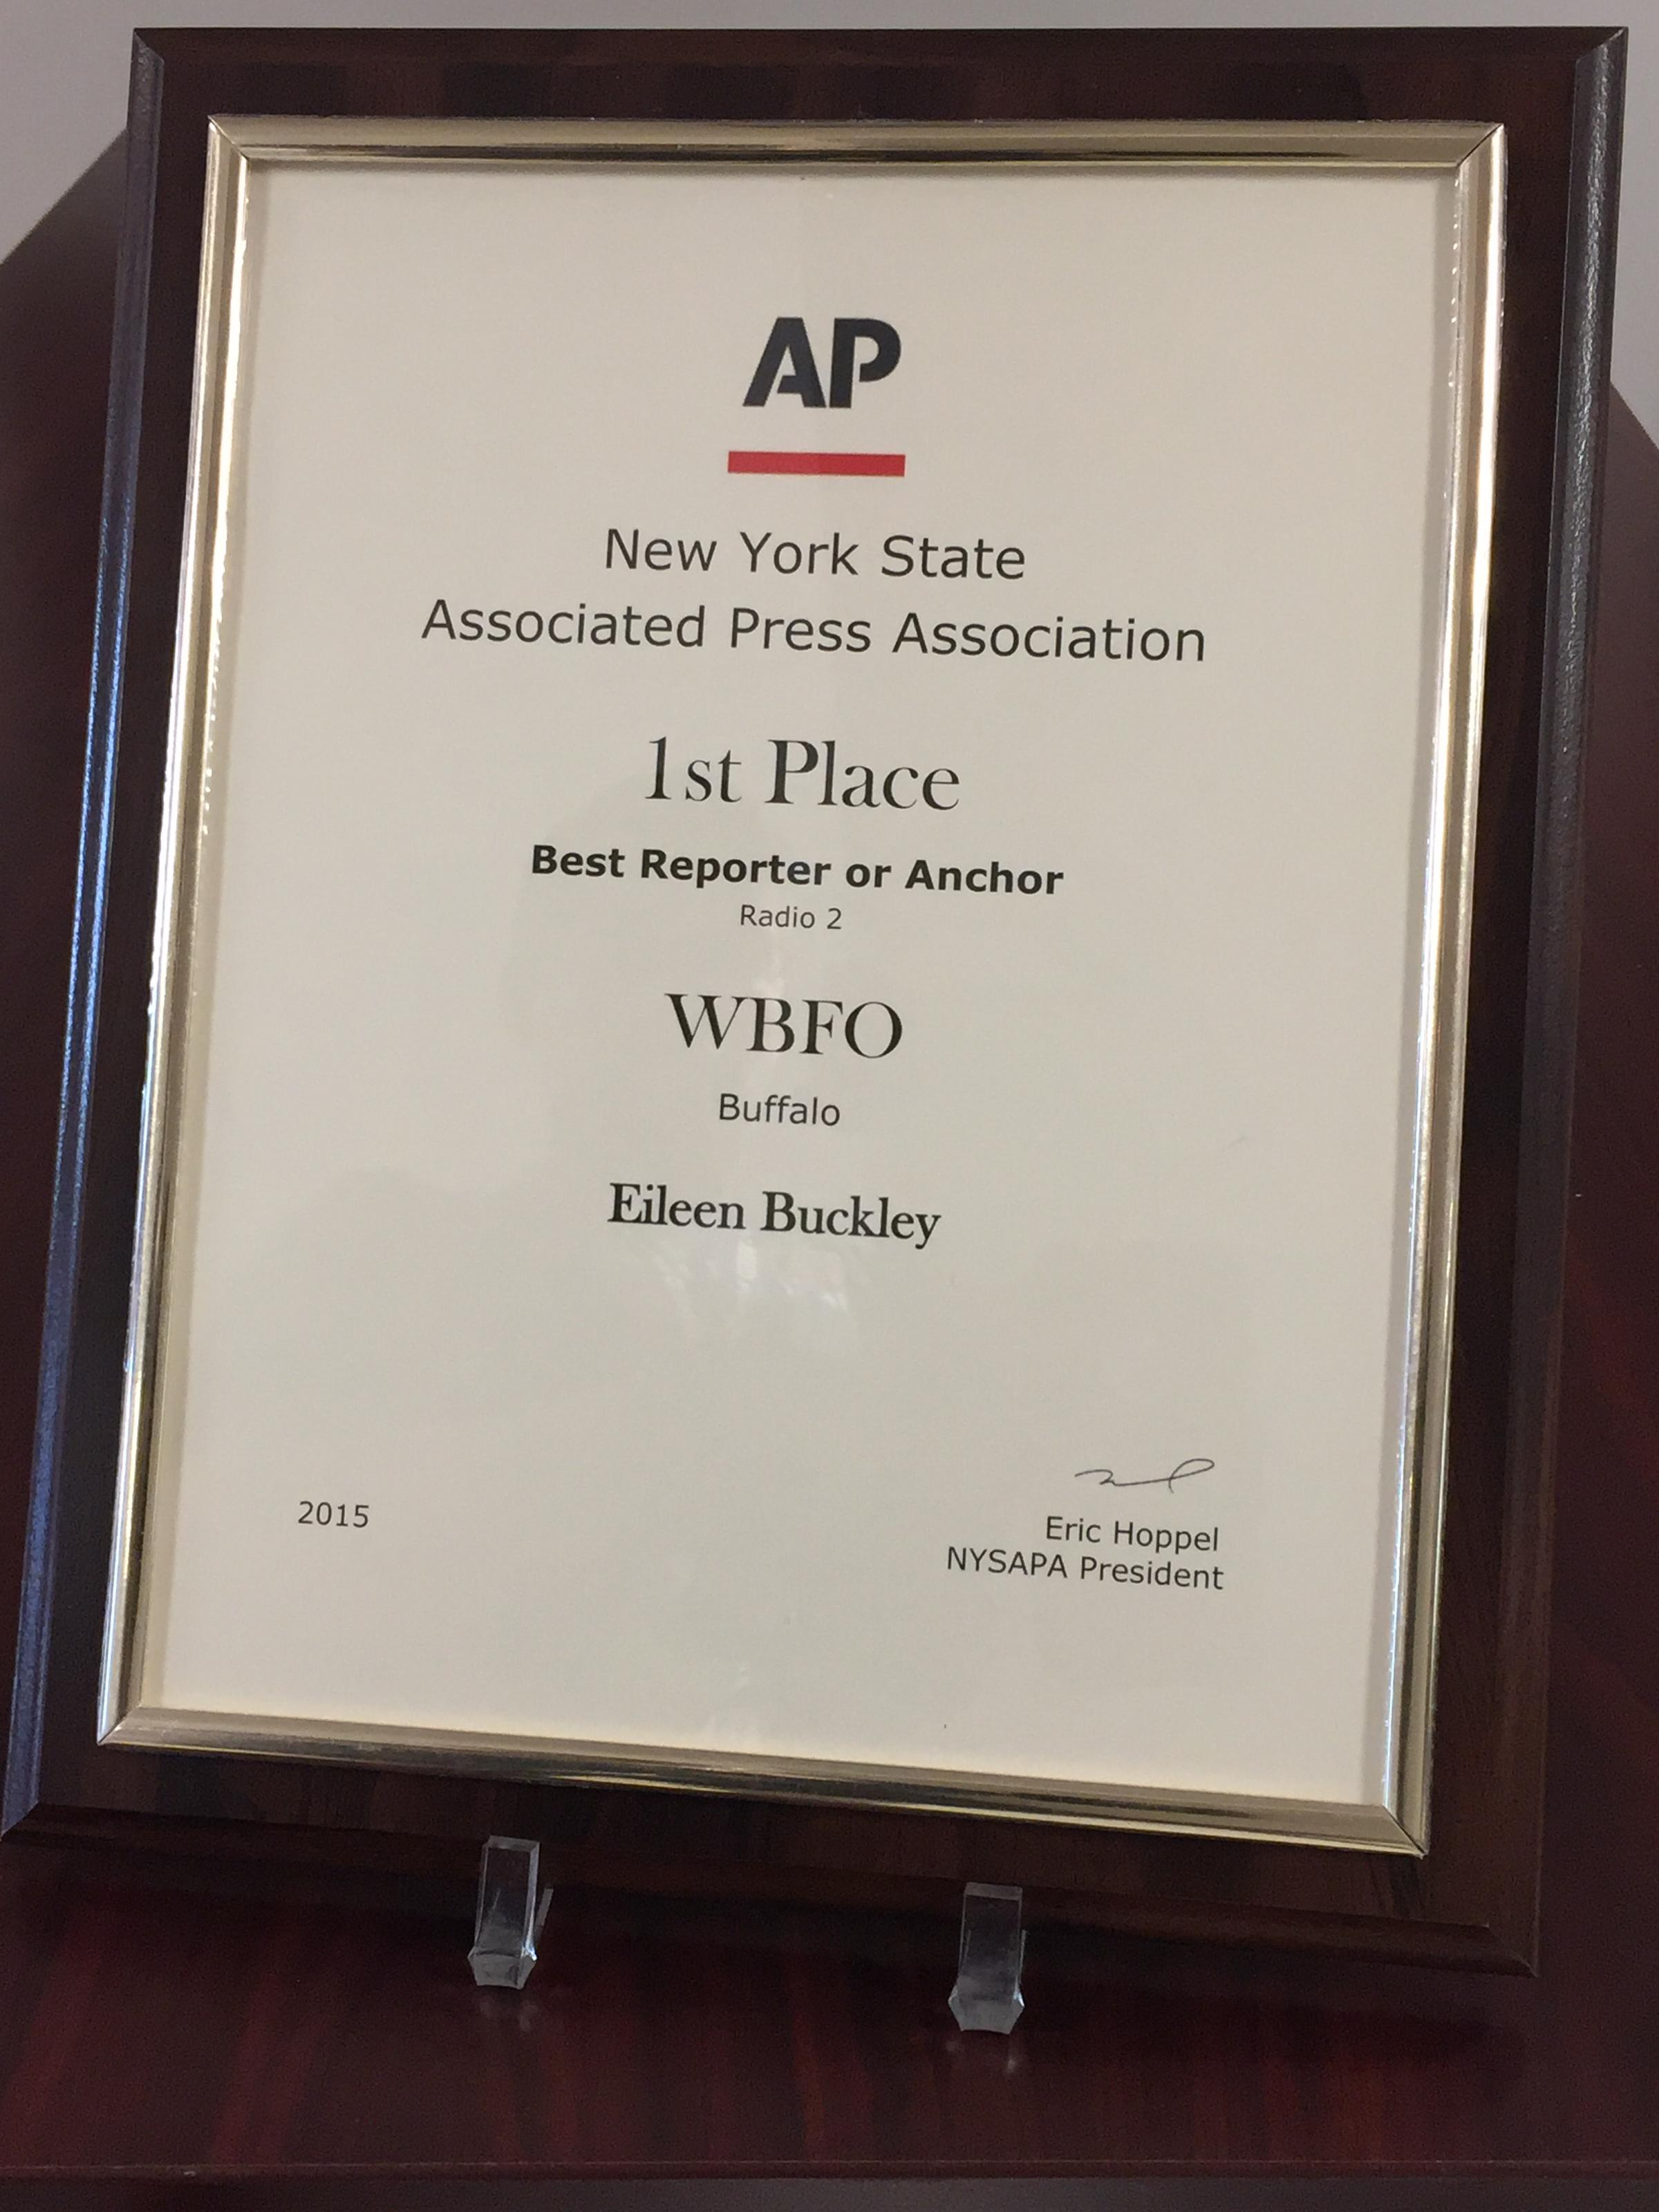 NY State Associated Press Association names award winners